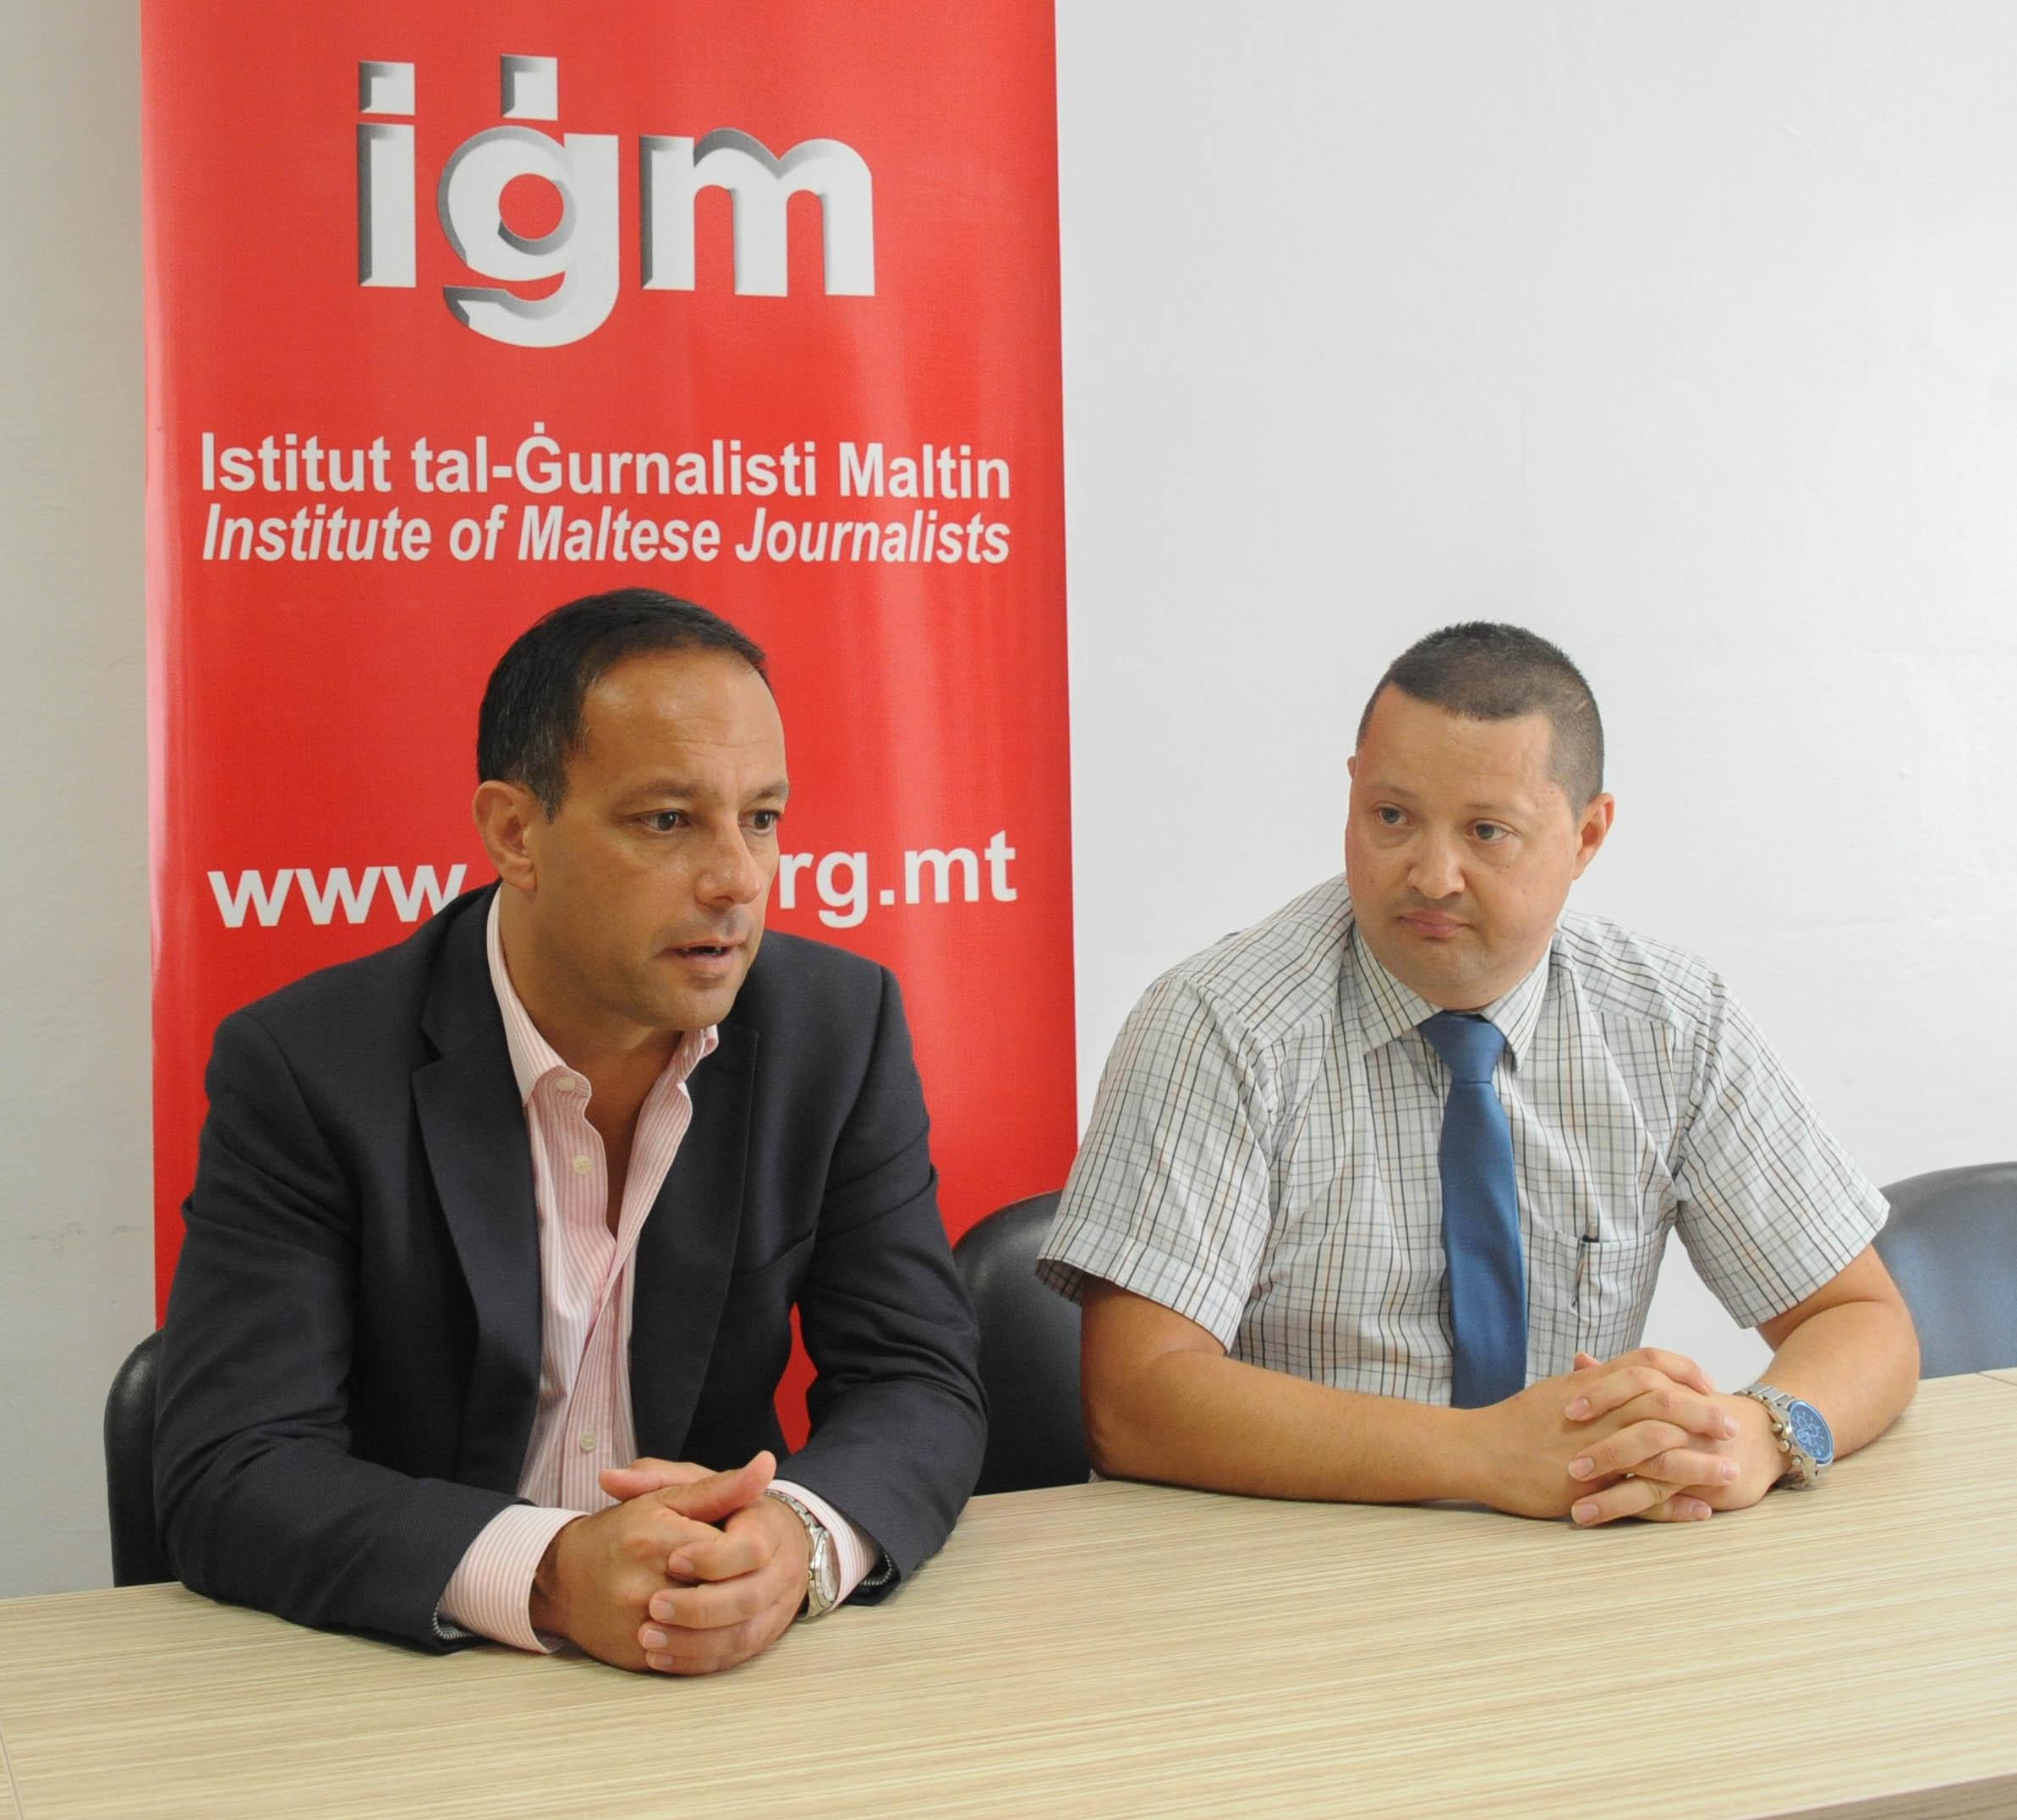 v18-press-conference-igm